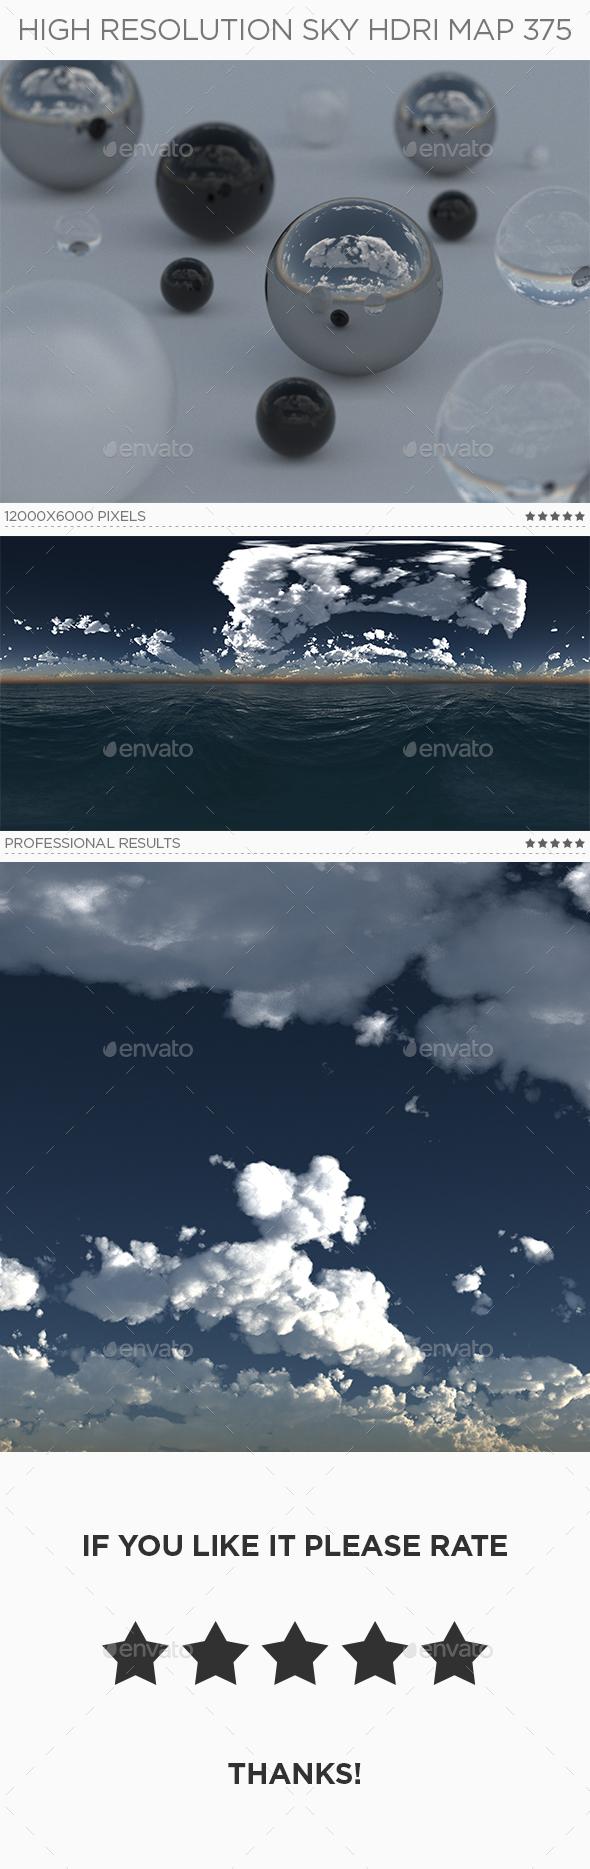 High Resolution Sky HDRi Map 375 - 3DOcean Item for Sale